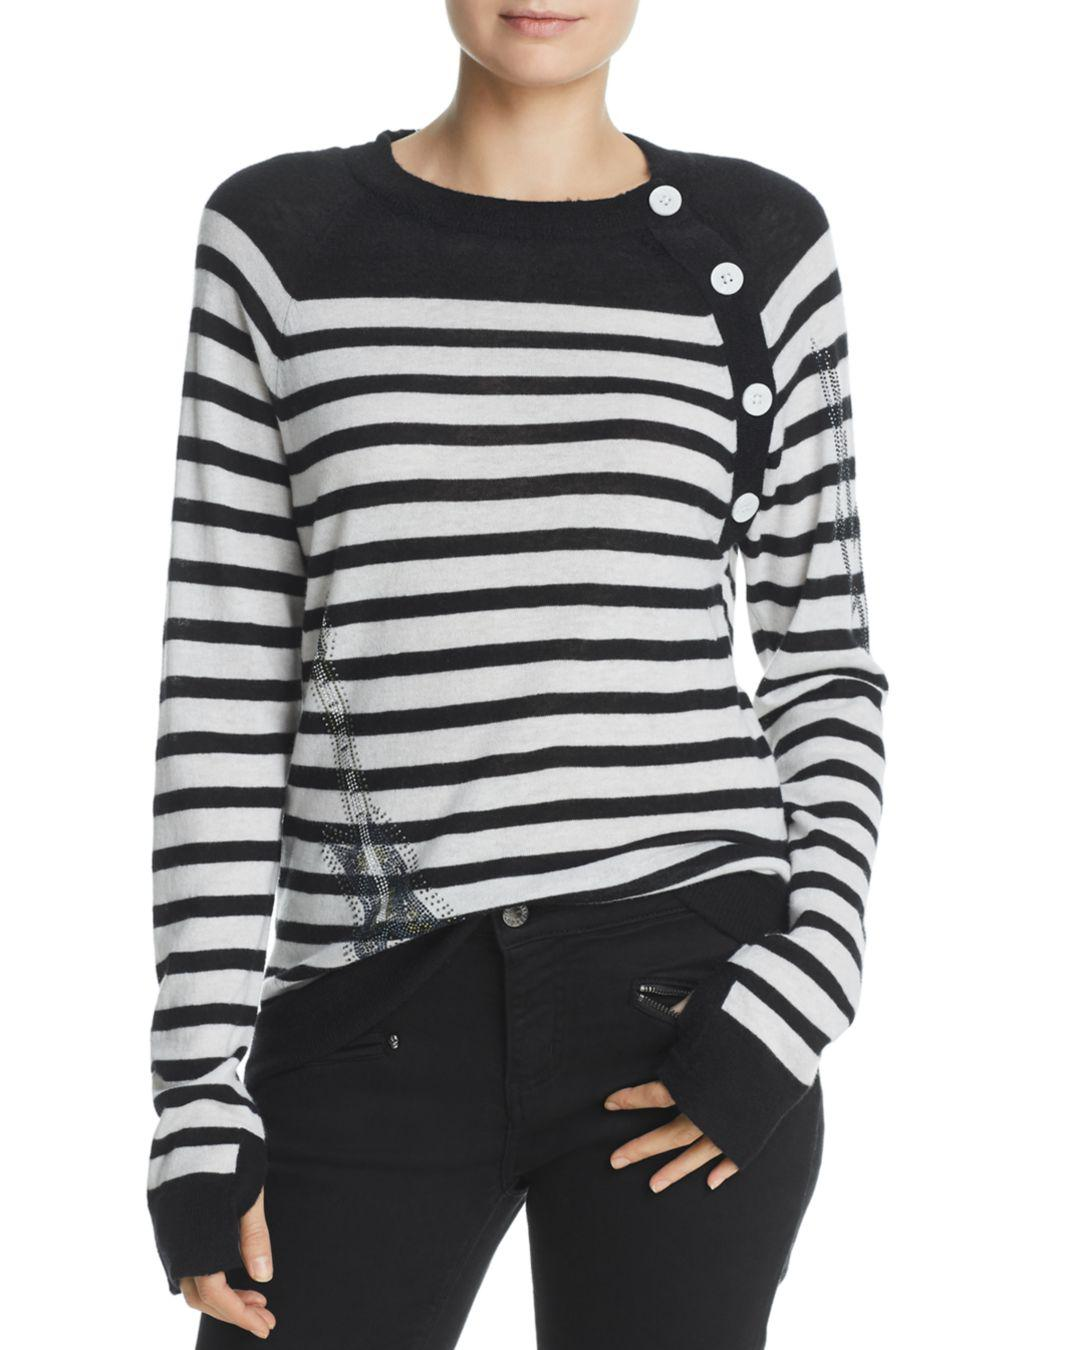 5044bcc6dfb8c4 Zadig & Voltaire Reglis Bis Striped Cashmere Sweater in Black - Save ...